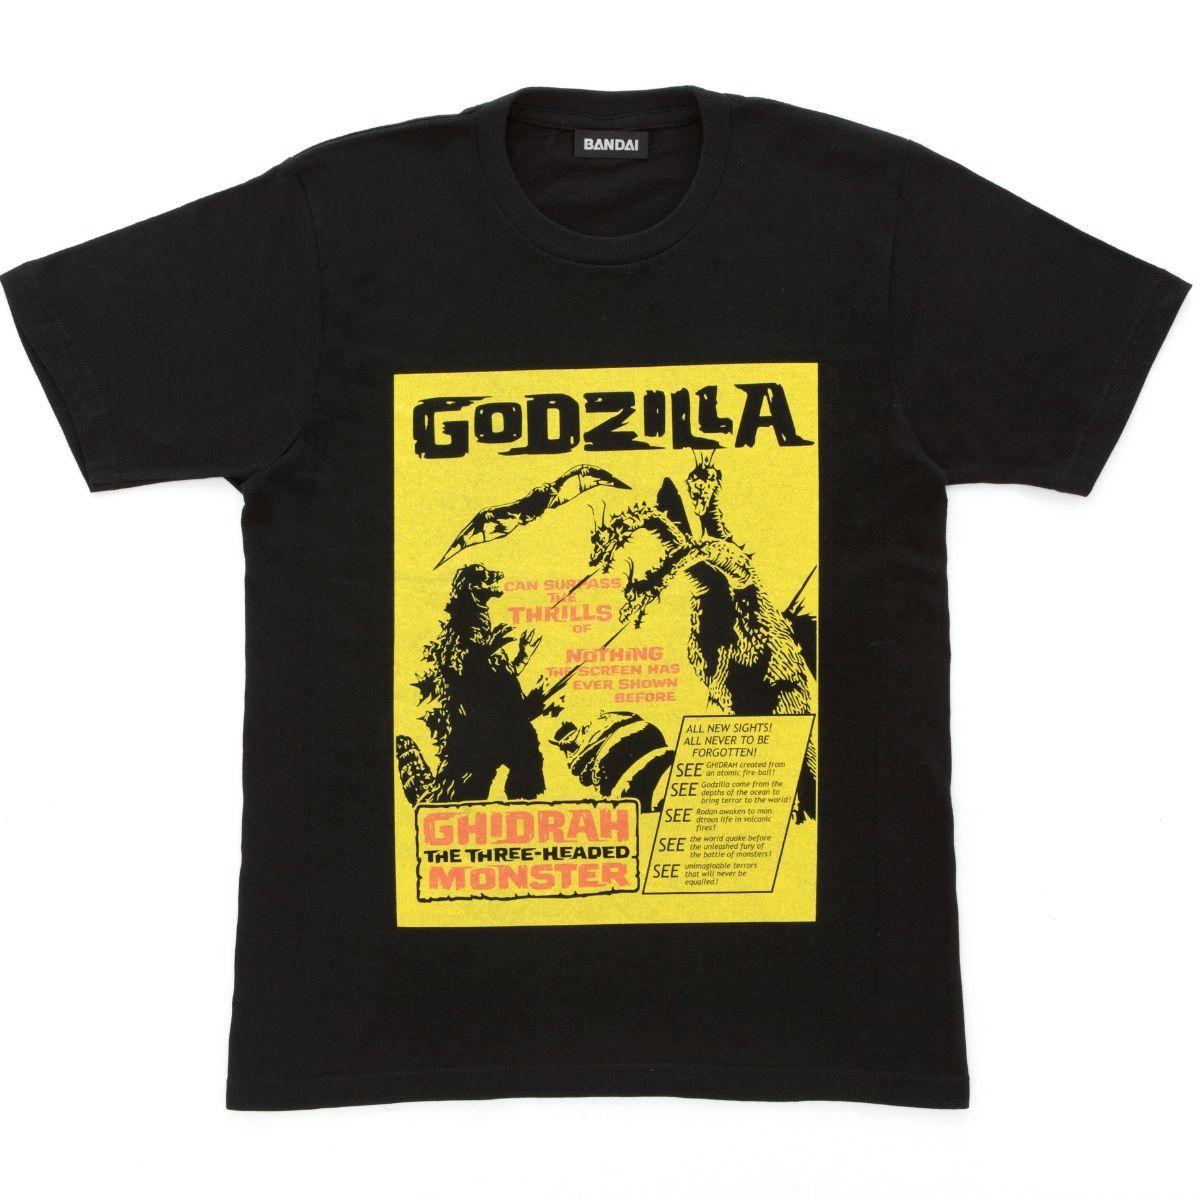 Godzilla 65th Anniversary Movie Poster T-shirt - Ghidorah: the Three-Headed Monster ver.